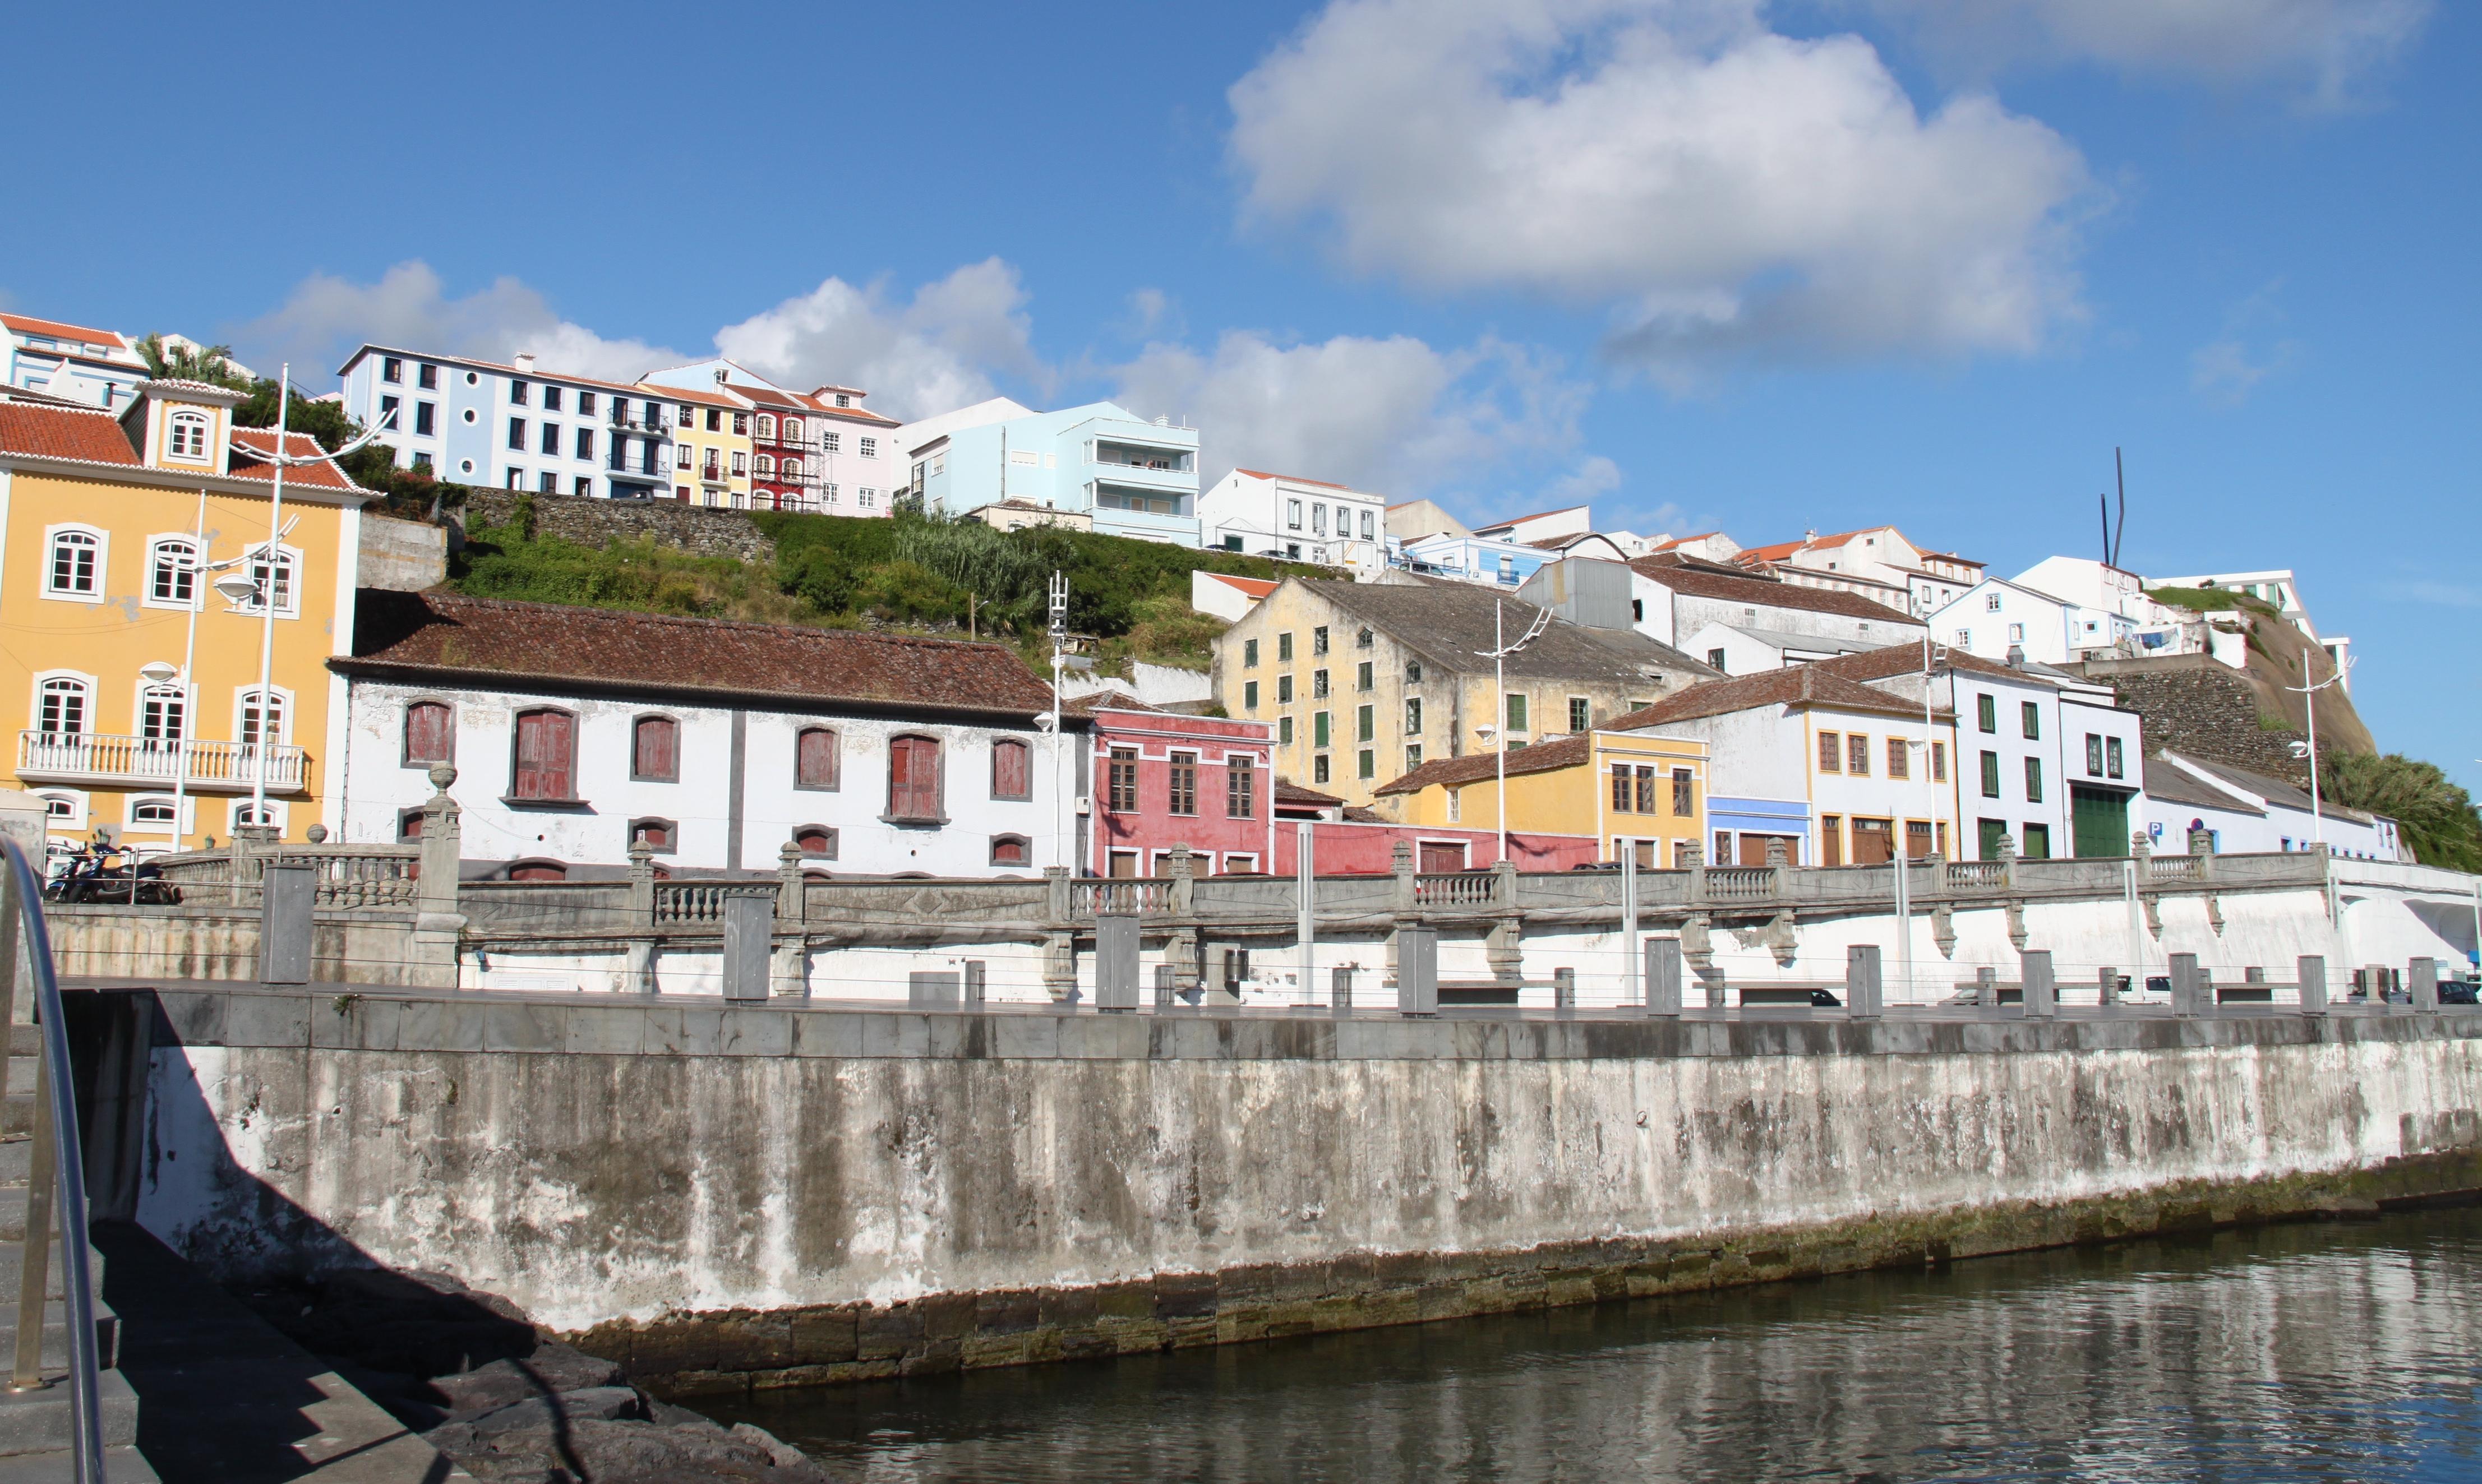 Angra de Heroismo, Terceira